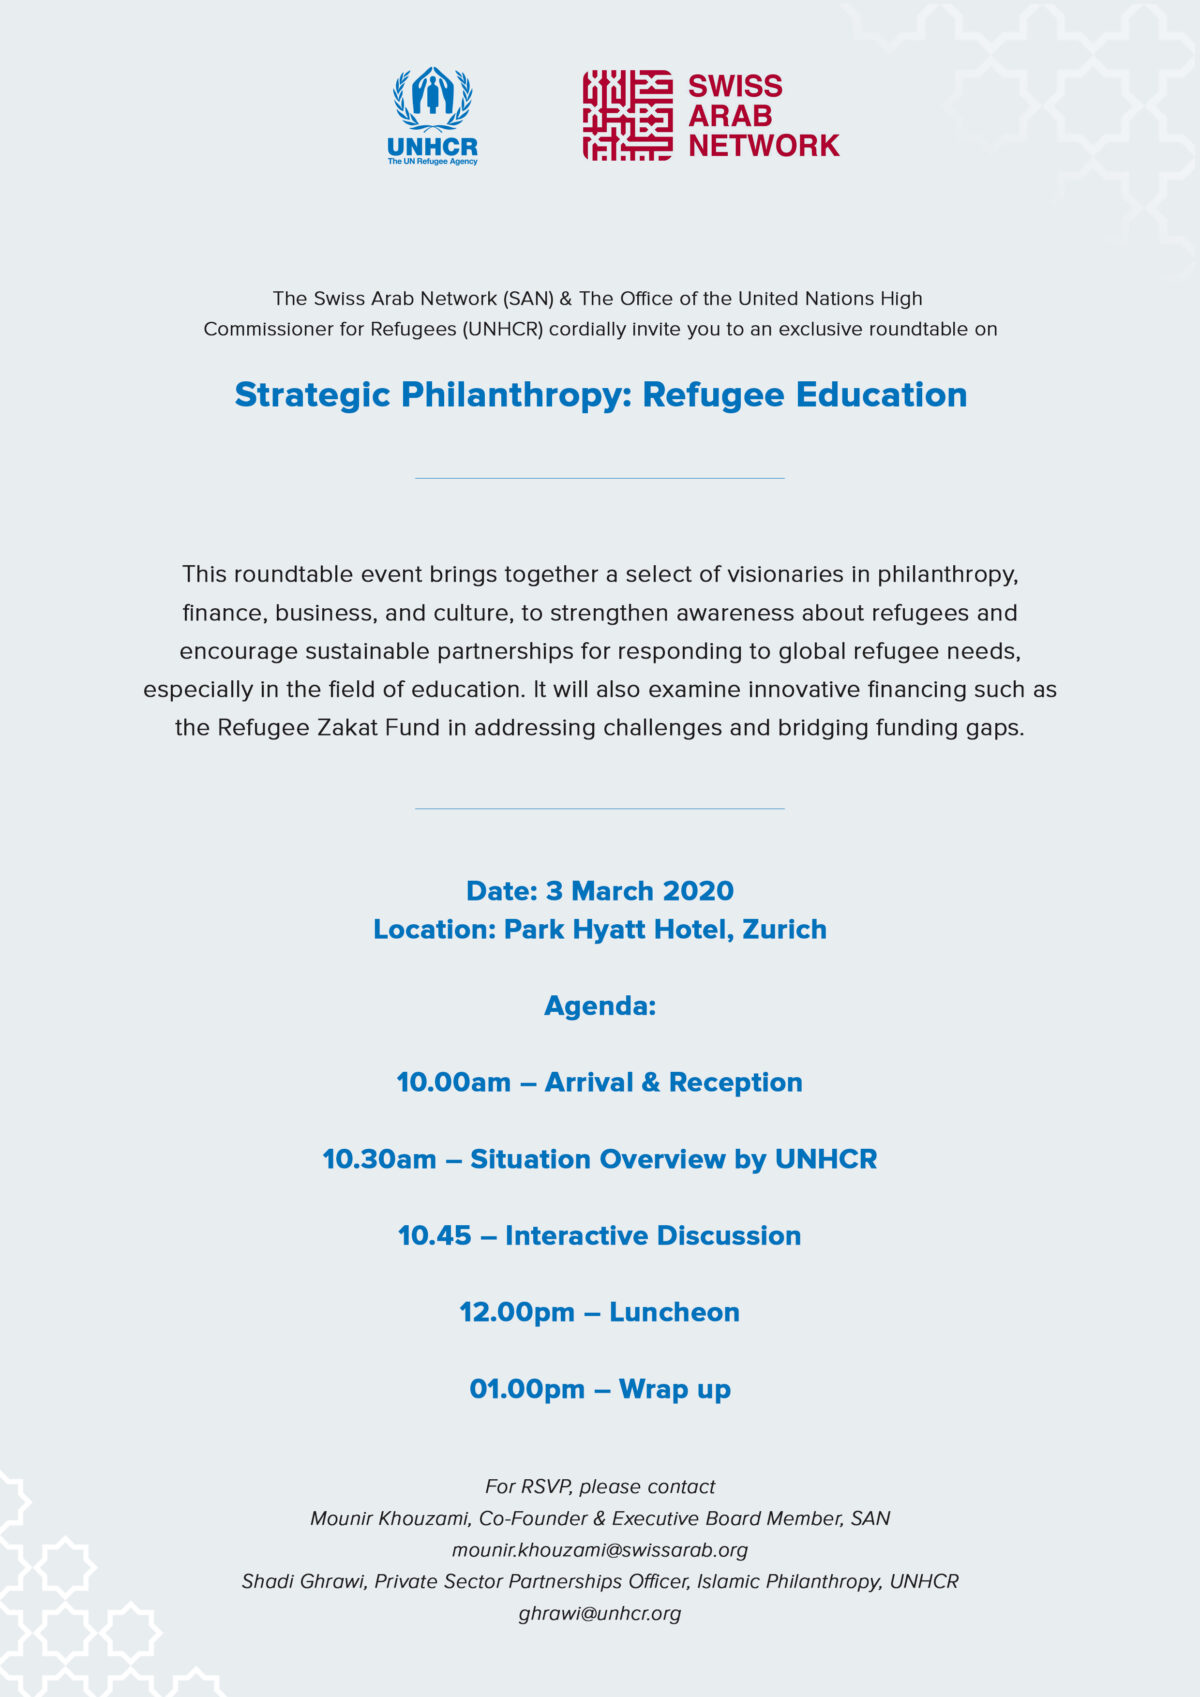 SANxUNHCR Roundtable